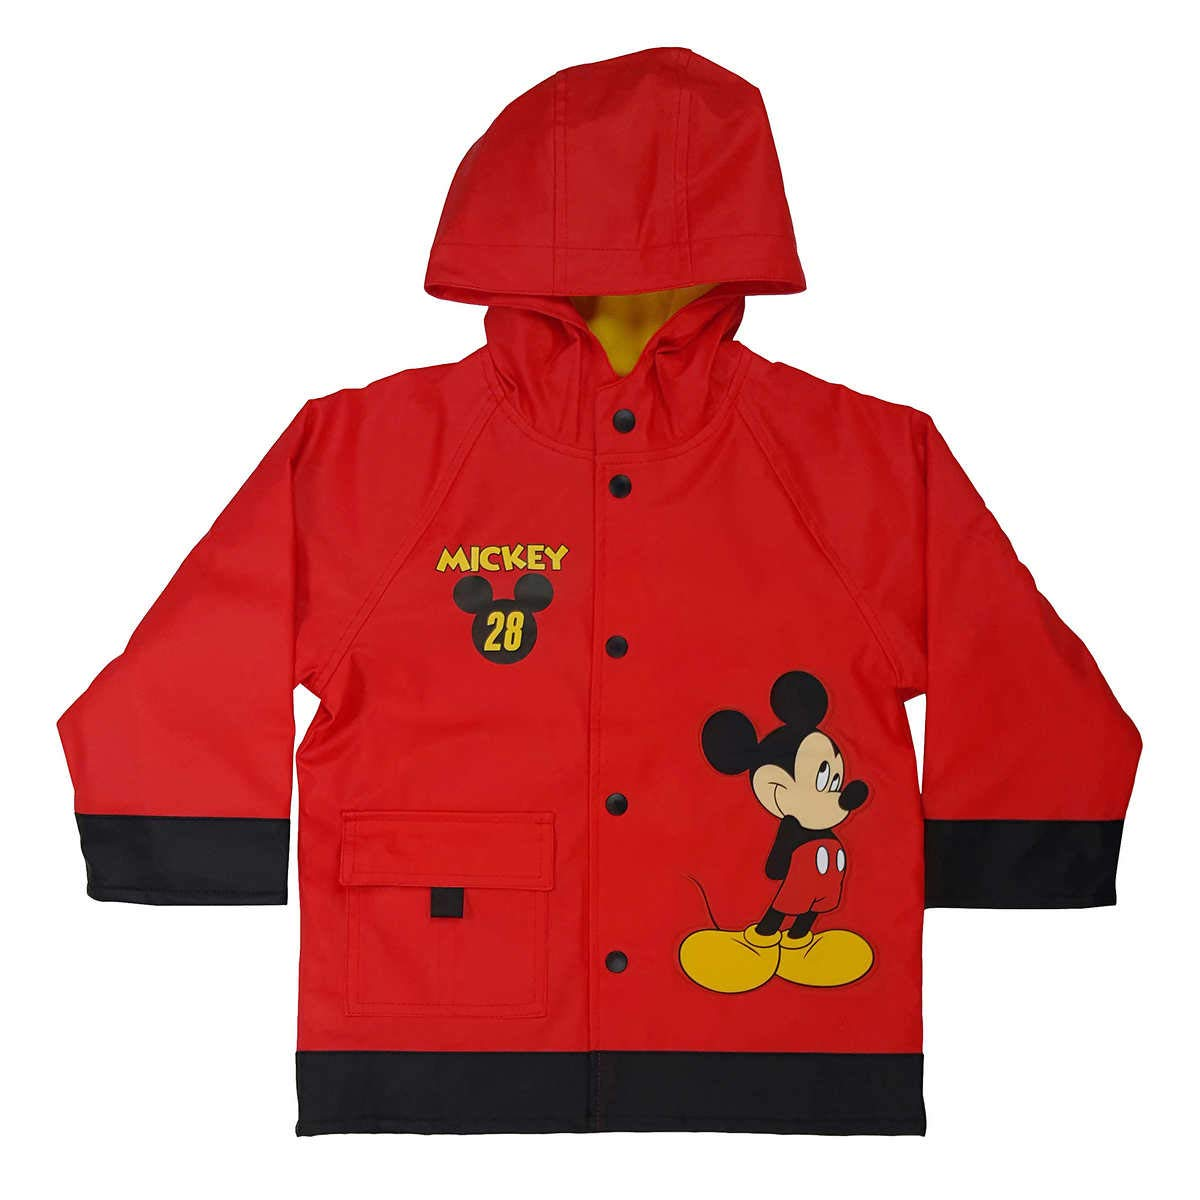 Activewear Boys Location Waterproof Fleece Lined Black Winter Jacket Kids School Coat New Sturdy Construction Clothing, Shoes & Accessories